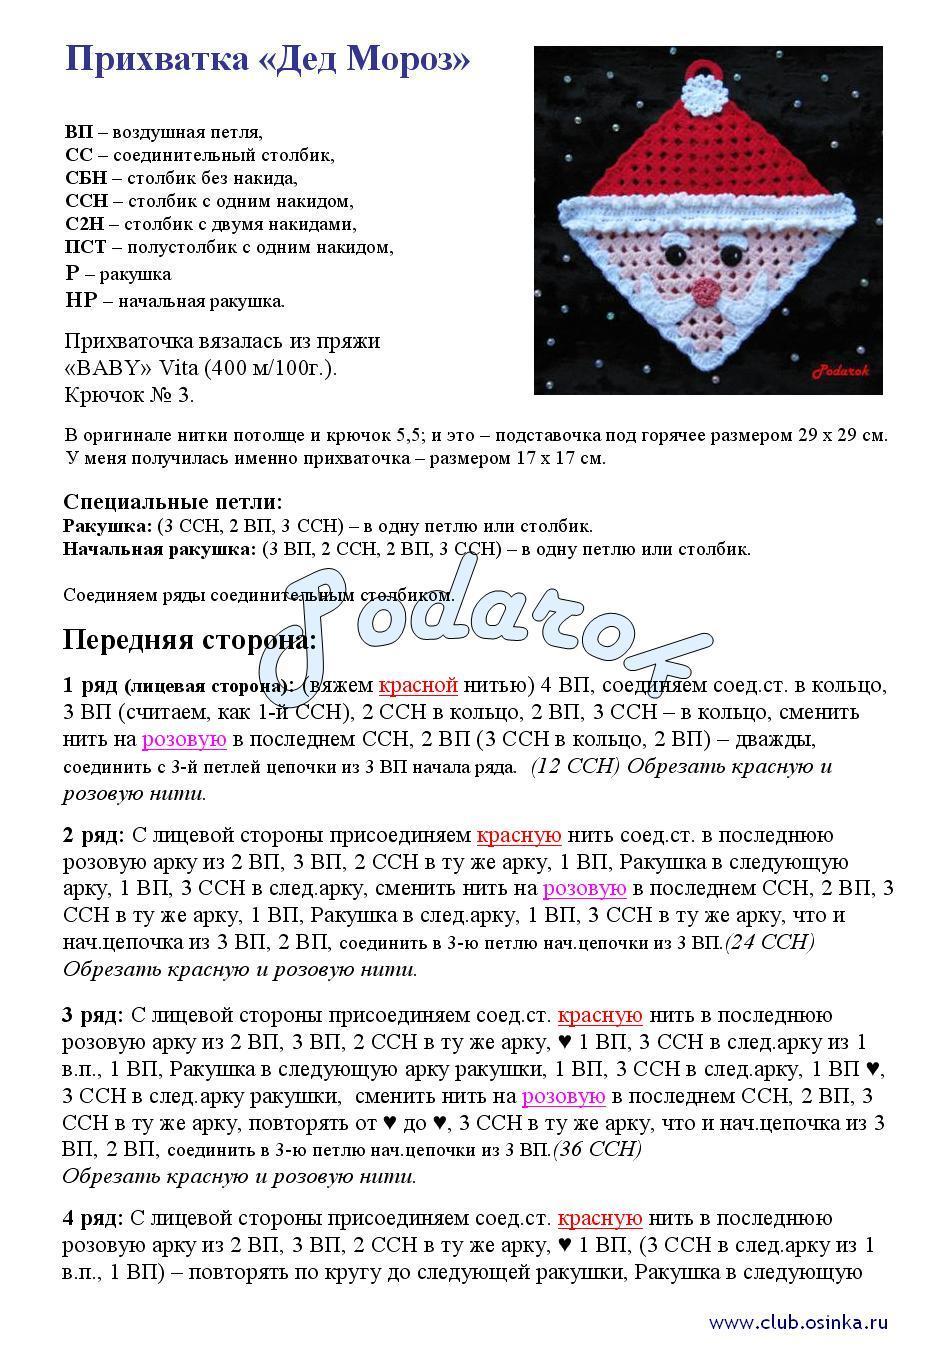 Схема образования связи h2s фото 1